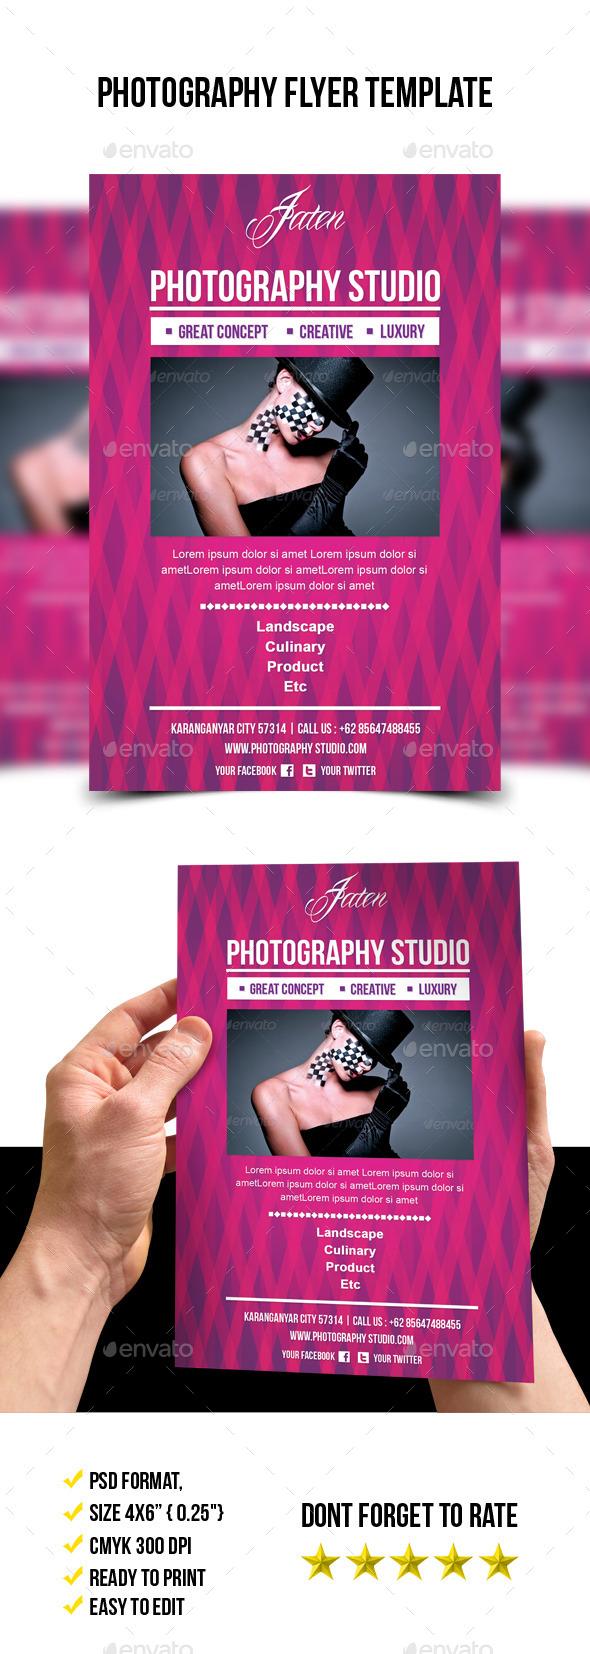 Photography Studio Flyer - Corporate Flyers